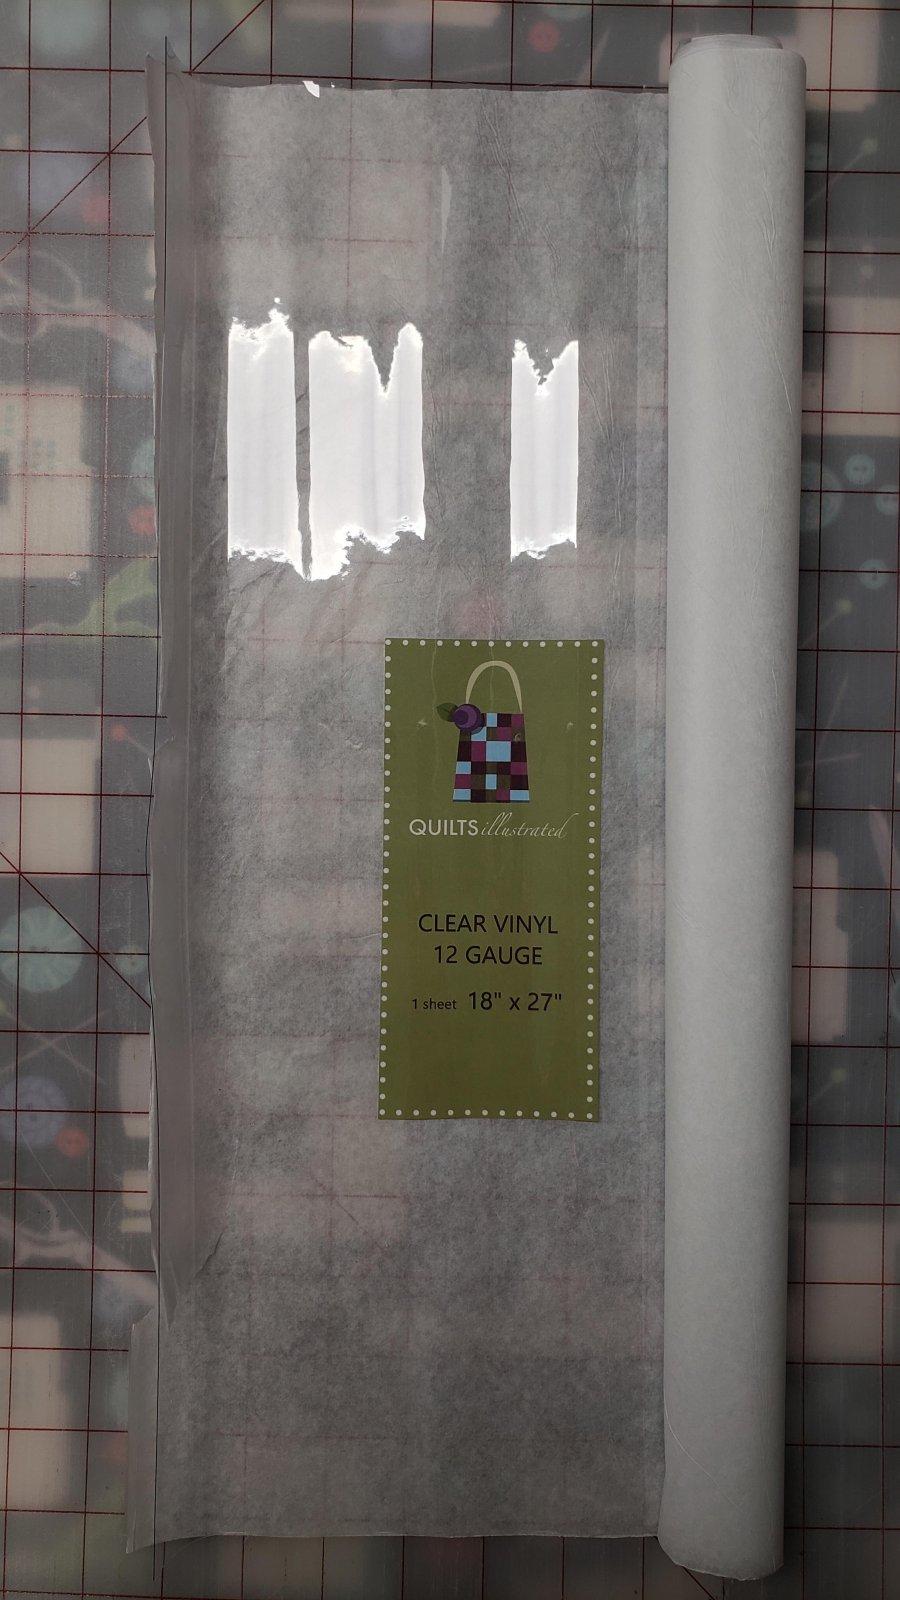 Clear Vinyl, 12 Gauge 18 x 27